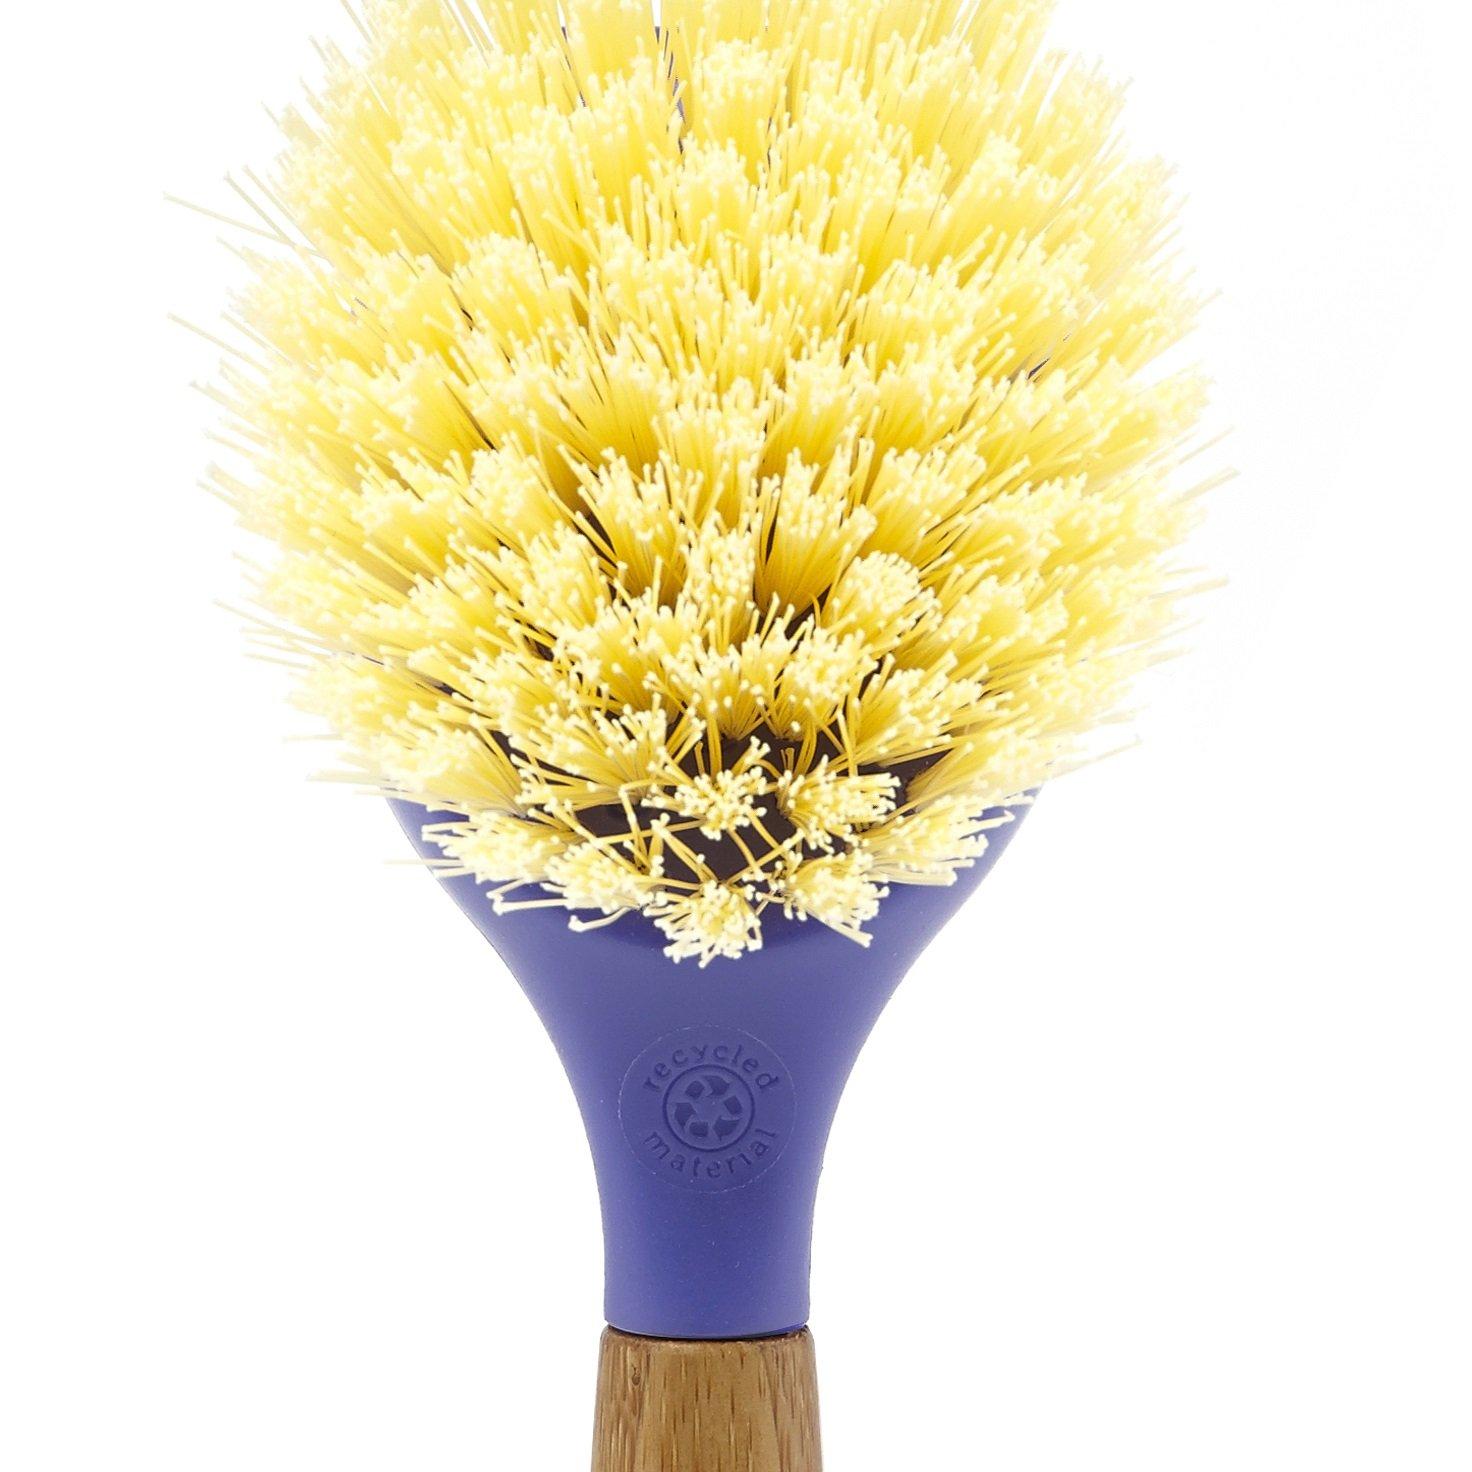 Full Circle Be Good Kitchen Dish Brush with Bamboo Handle, Single Brush, Purple